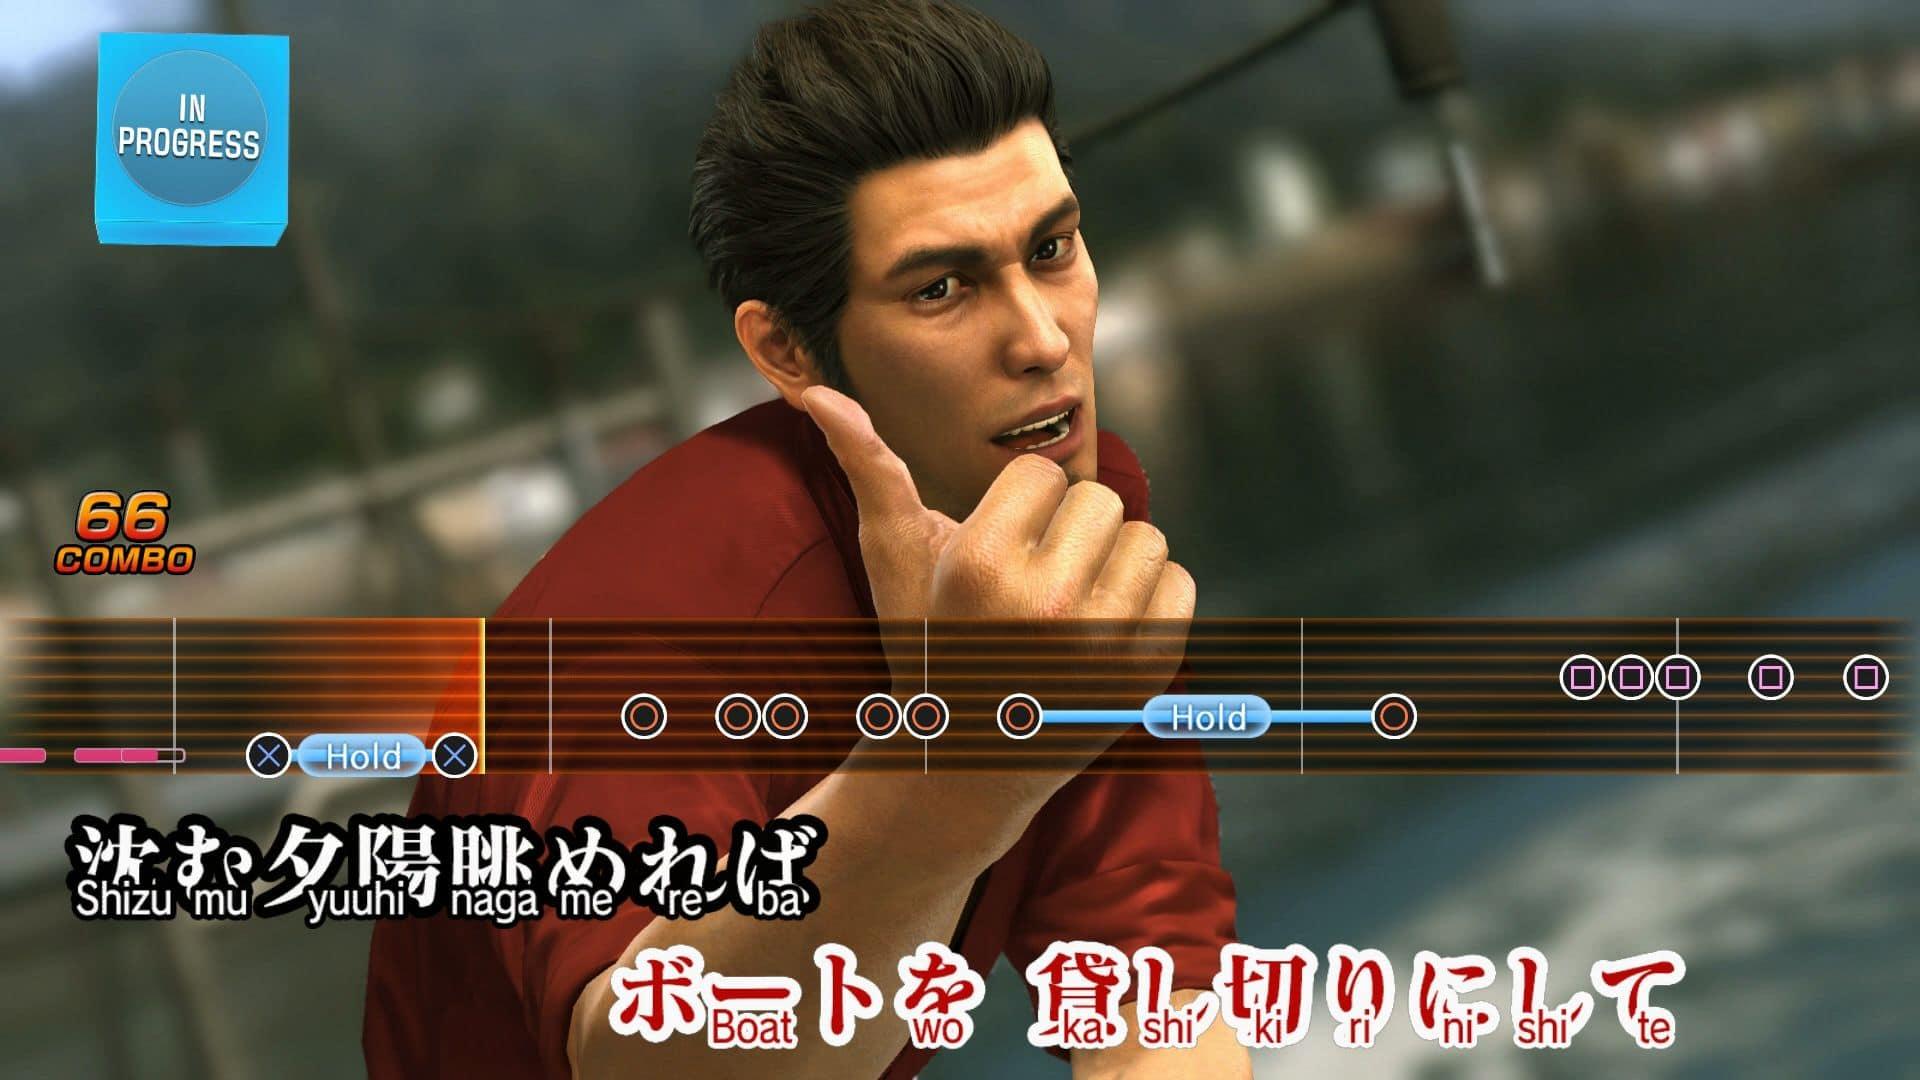 Yakuza 6 The Song of Life Screenshot - 0003